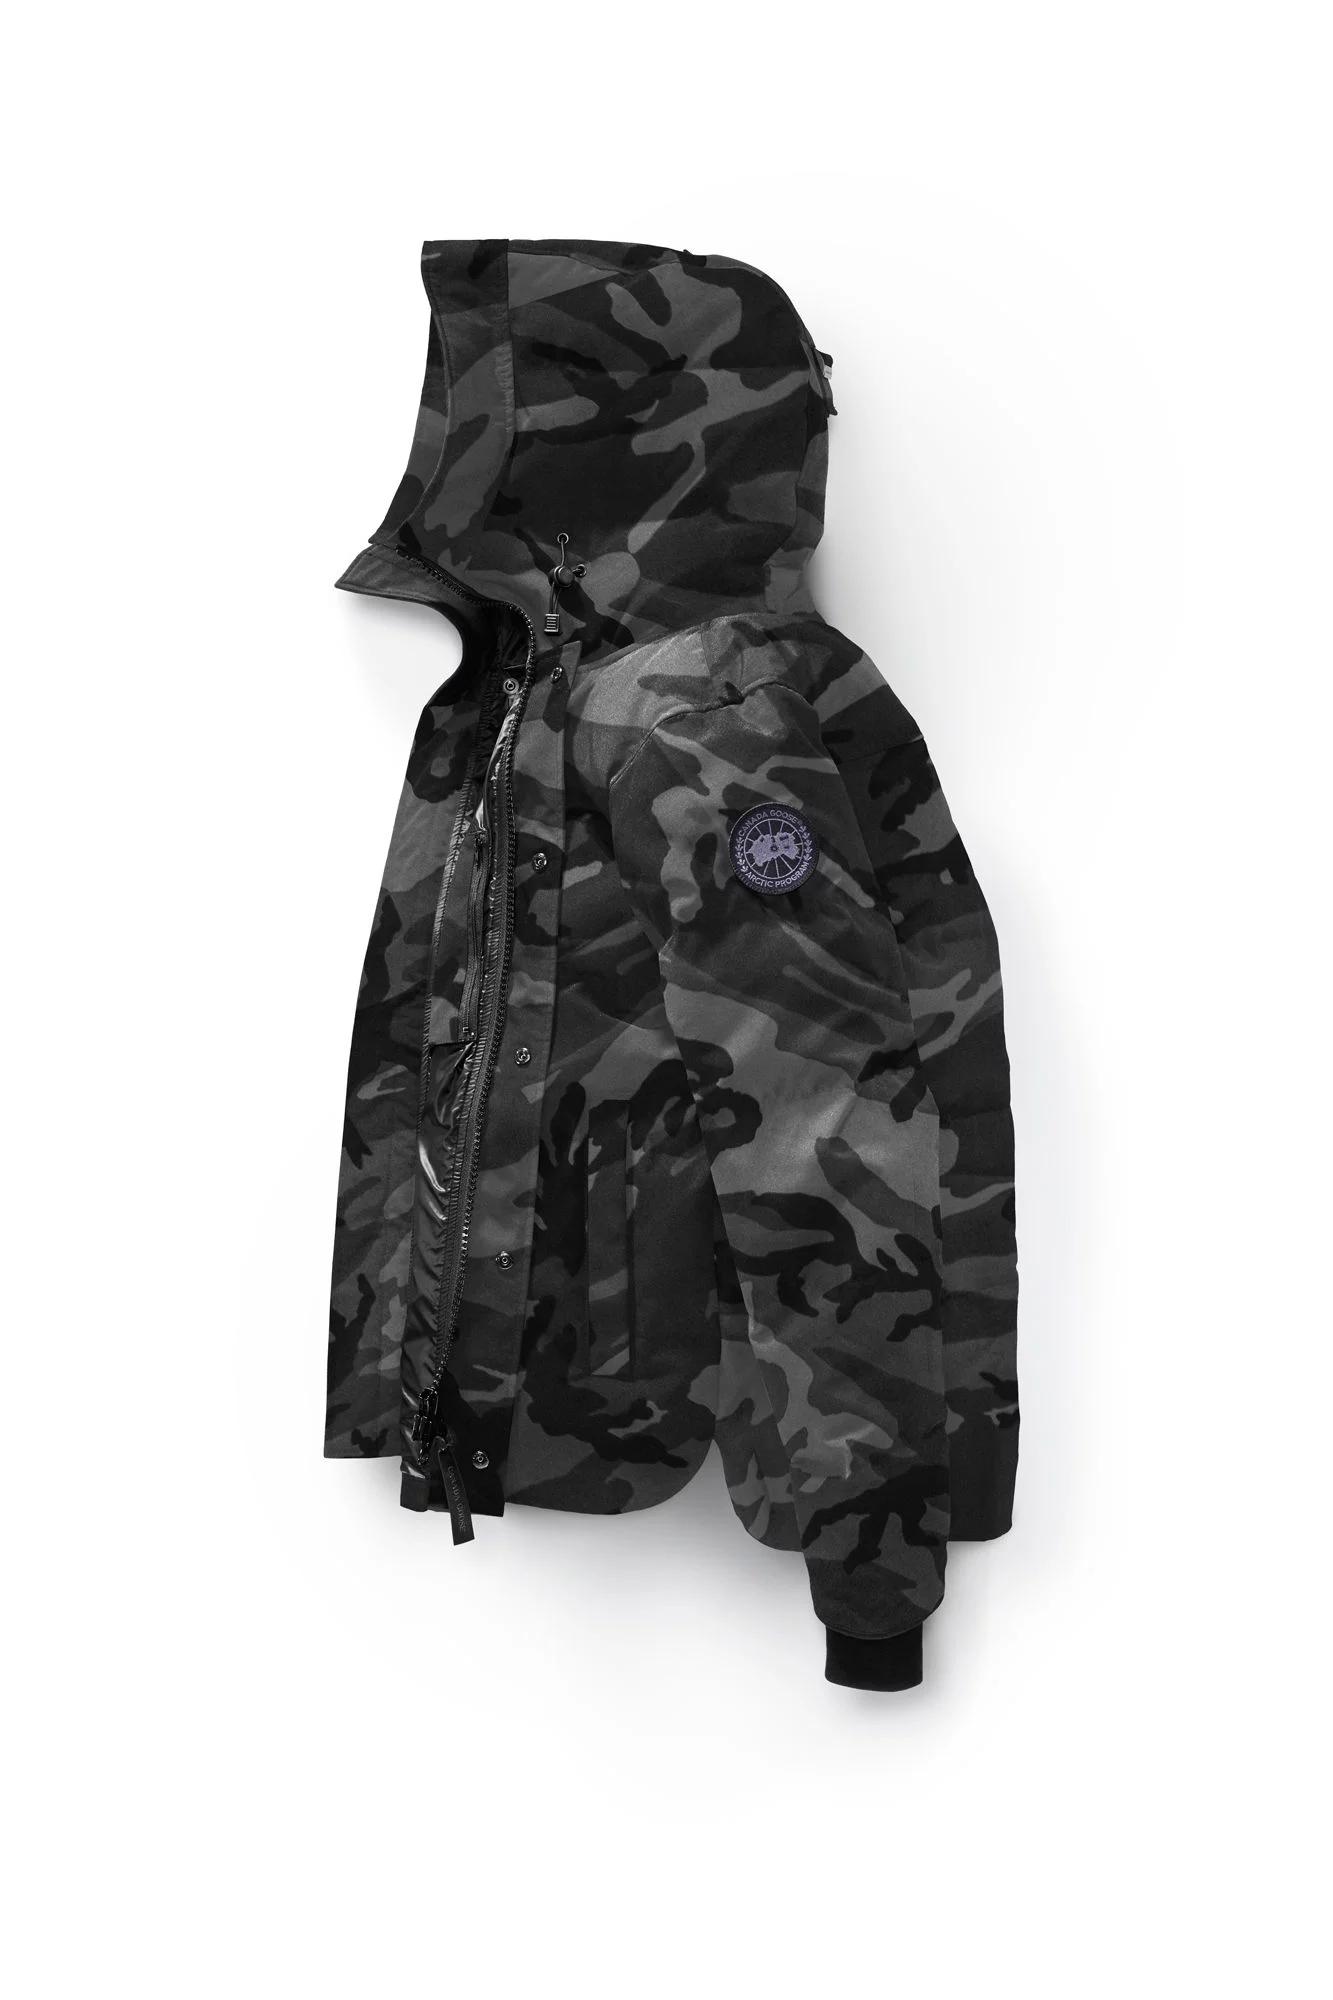 Macmillan Parka Black Military  5911